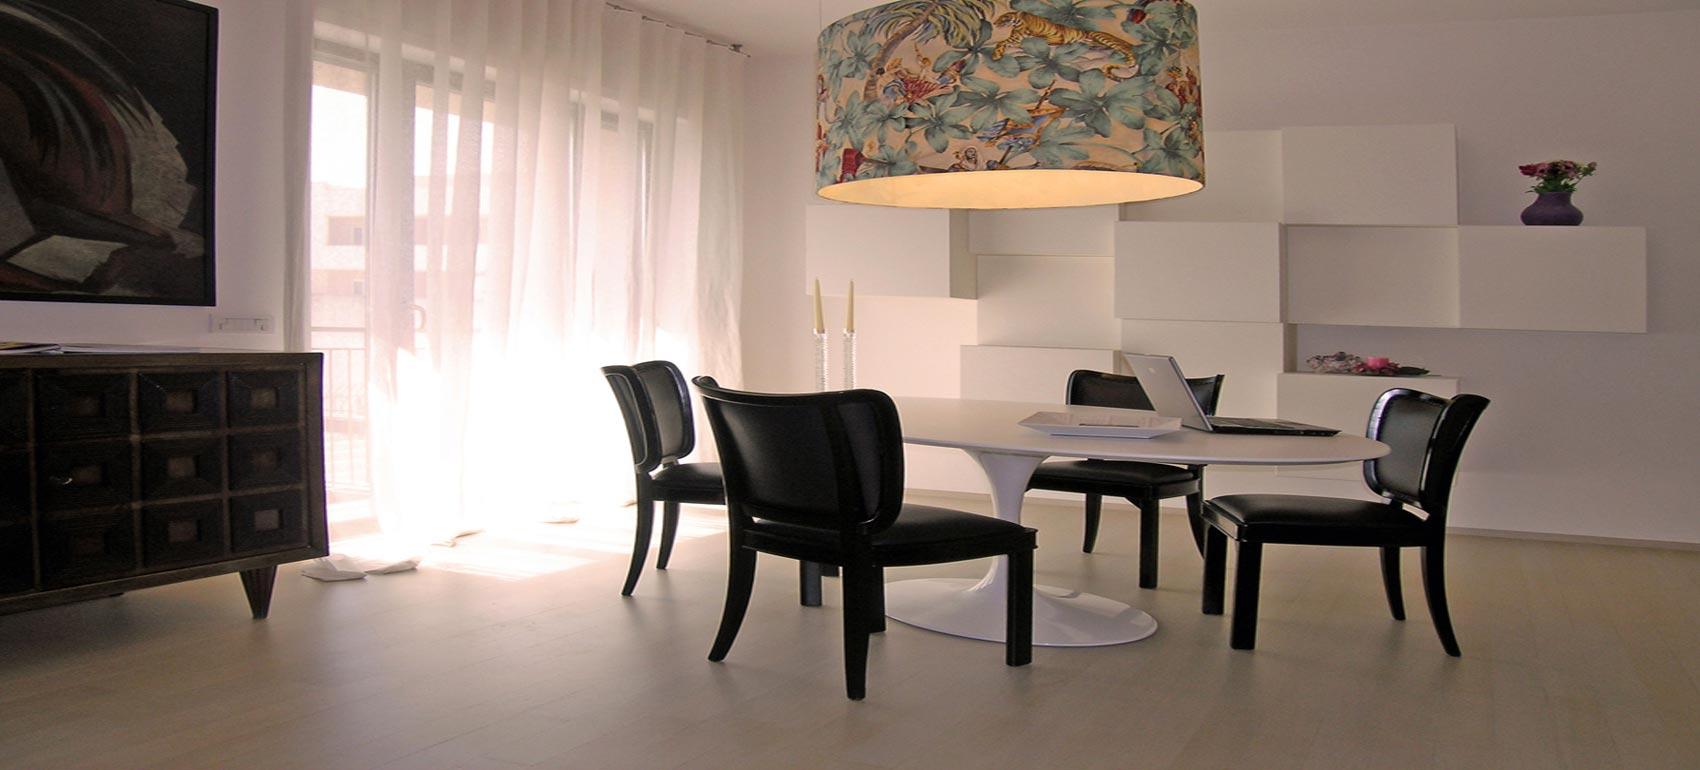 stefanoturi-architetto_residenzaprivata3_2